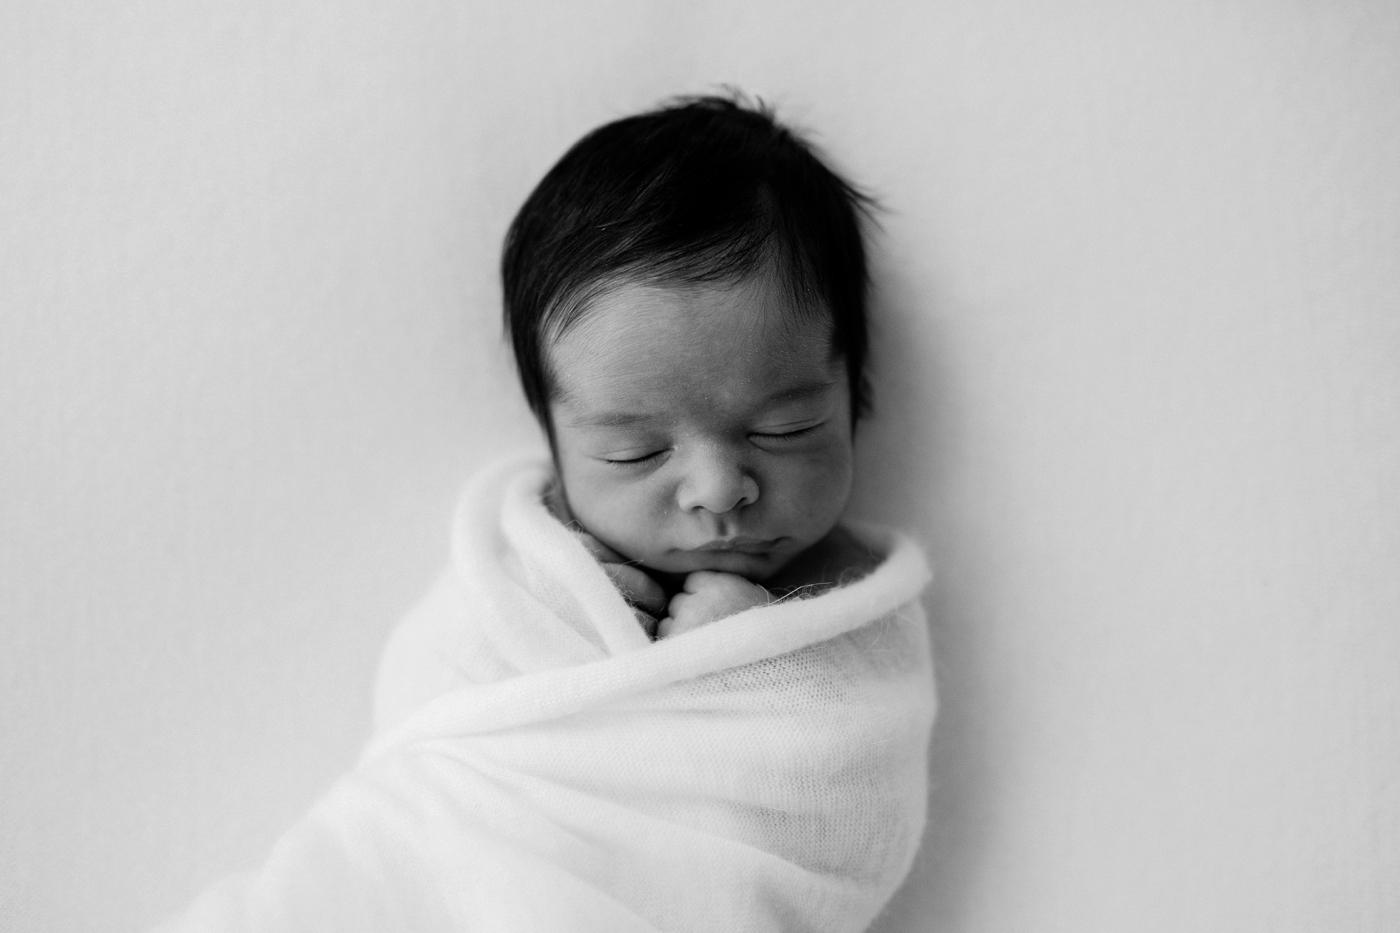 Baby WIlla - Natural newborn photographer in Adelaide - Natural light simple newborn photography - Katherine Schultz - www.katherineschultzphotography.com